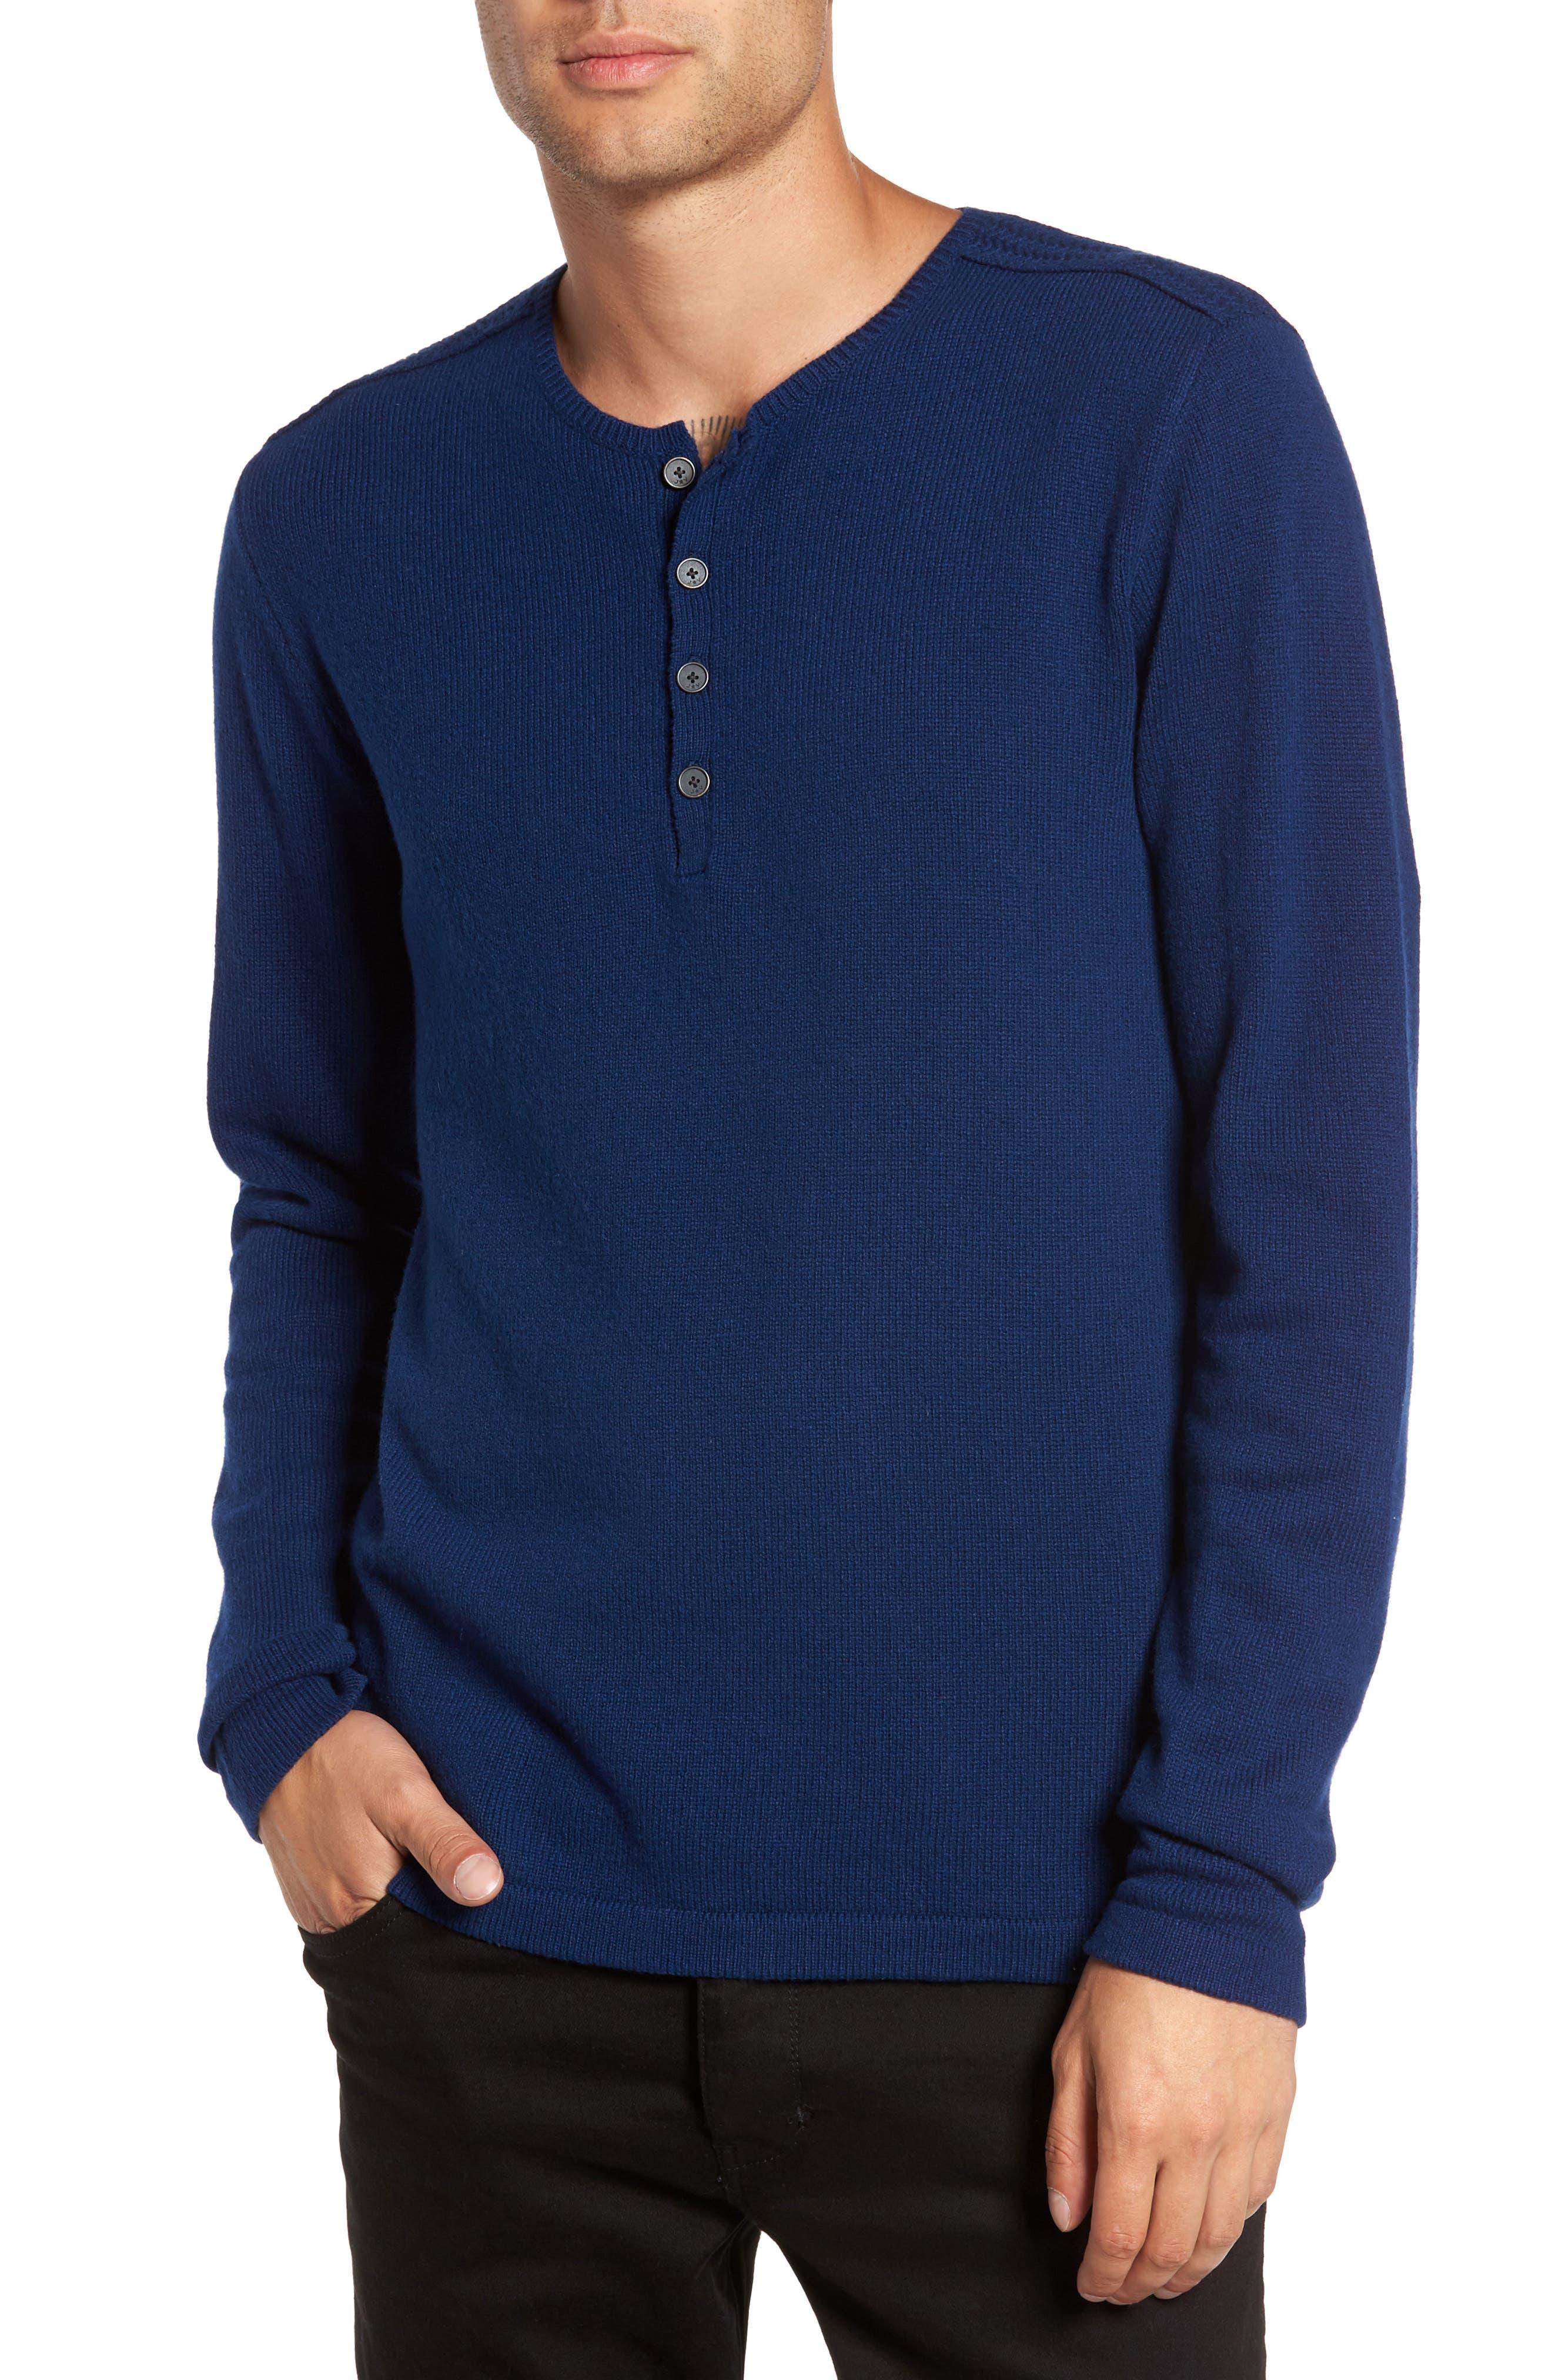 Henley Sweater,                             Main thumbnail 1, color,                             Atlantic Blue